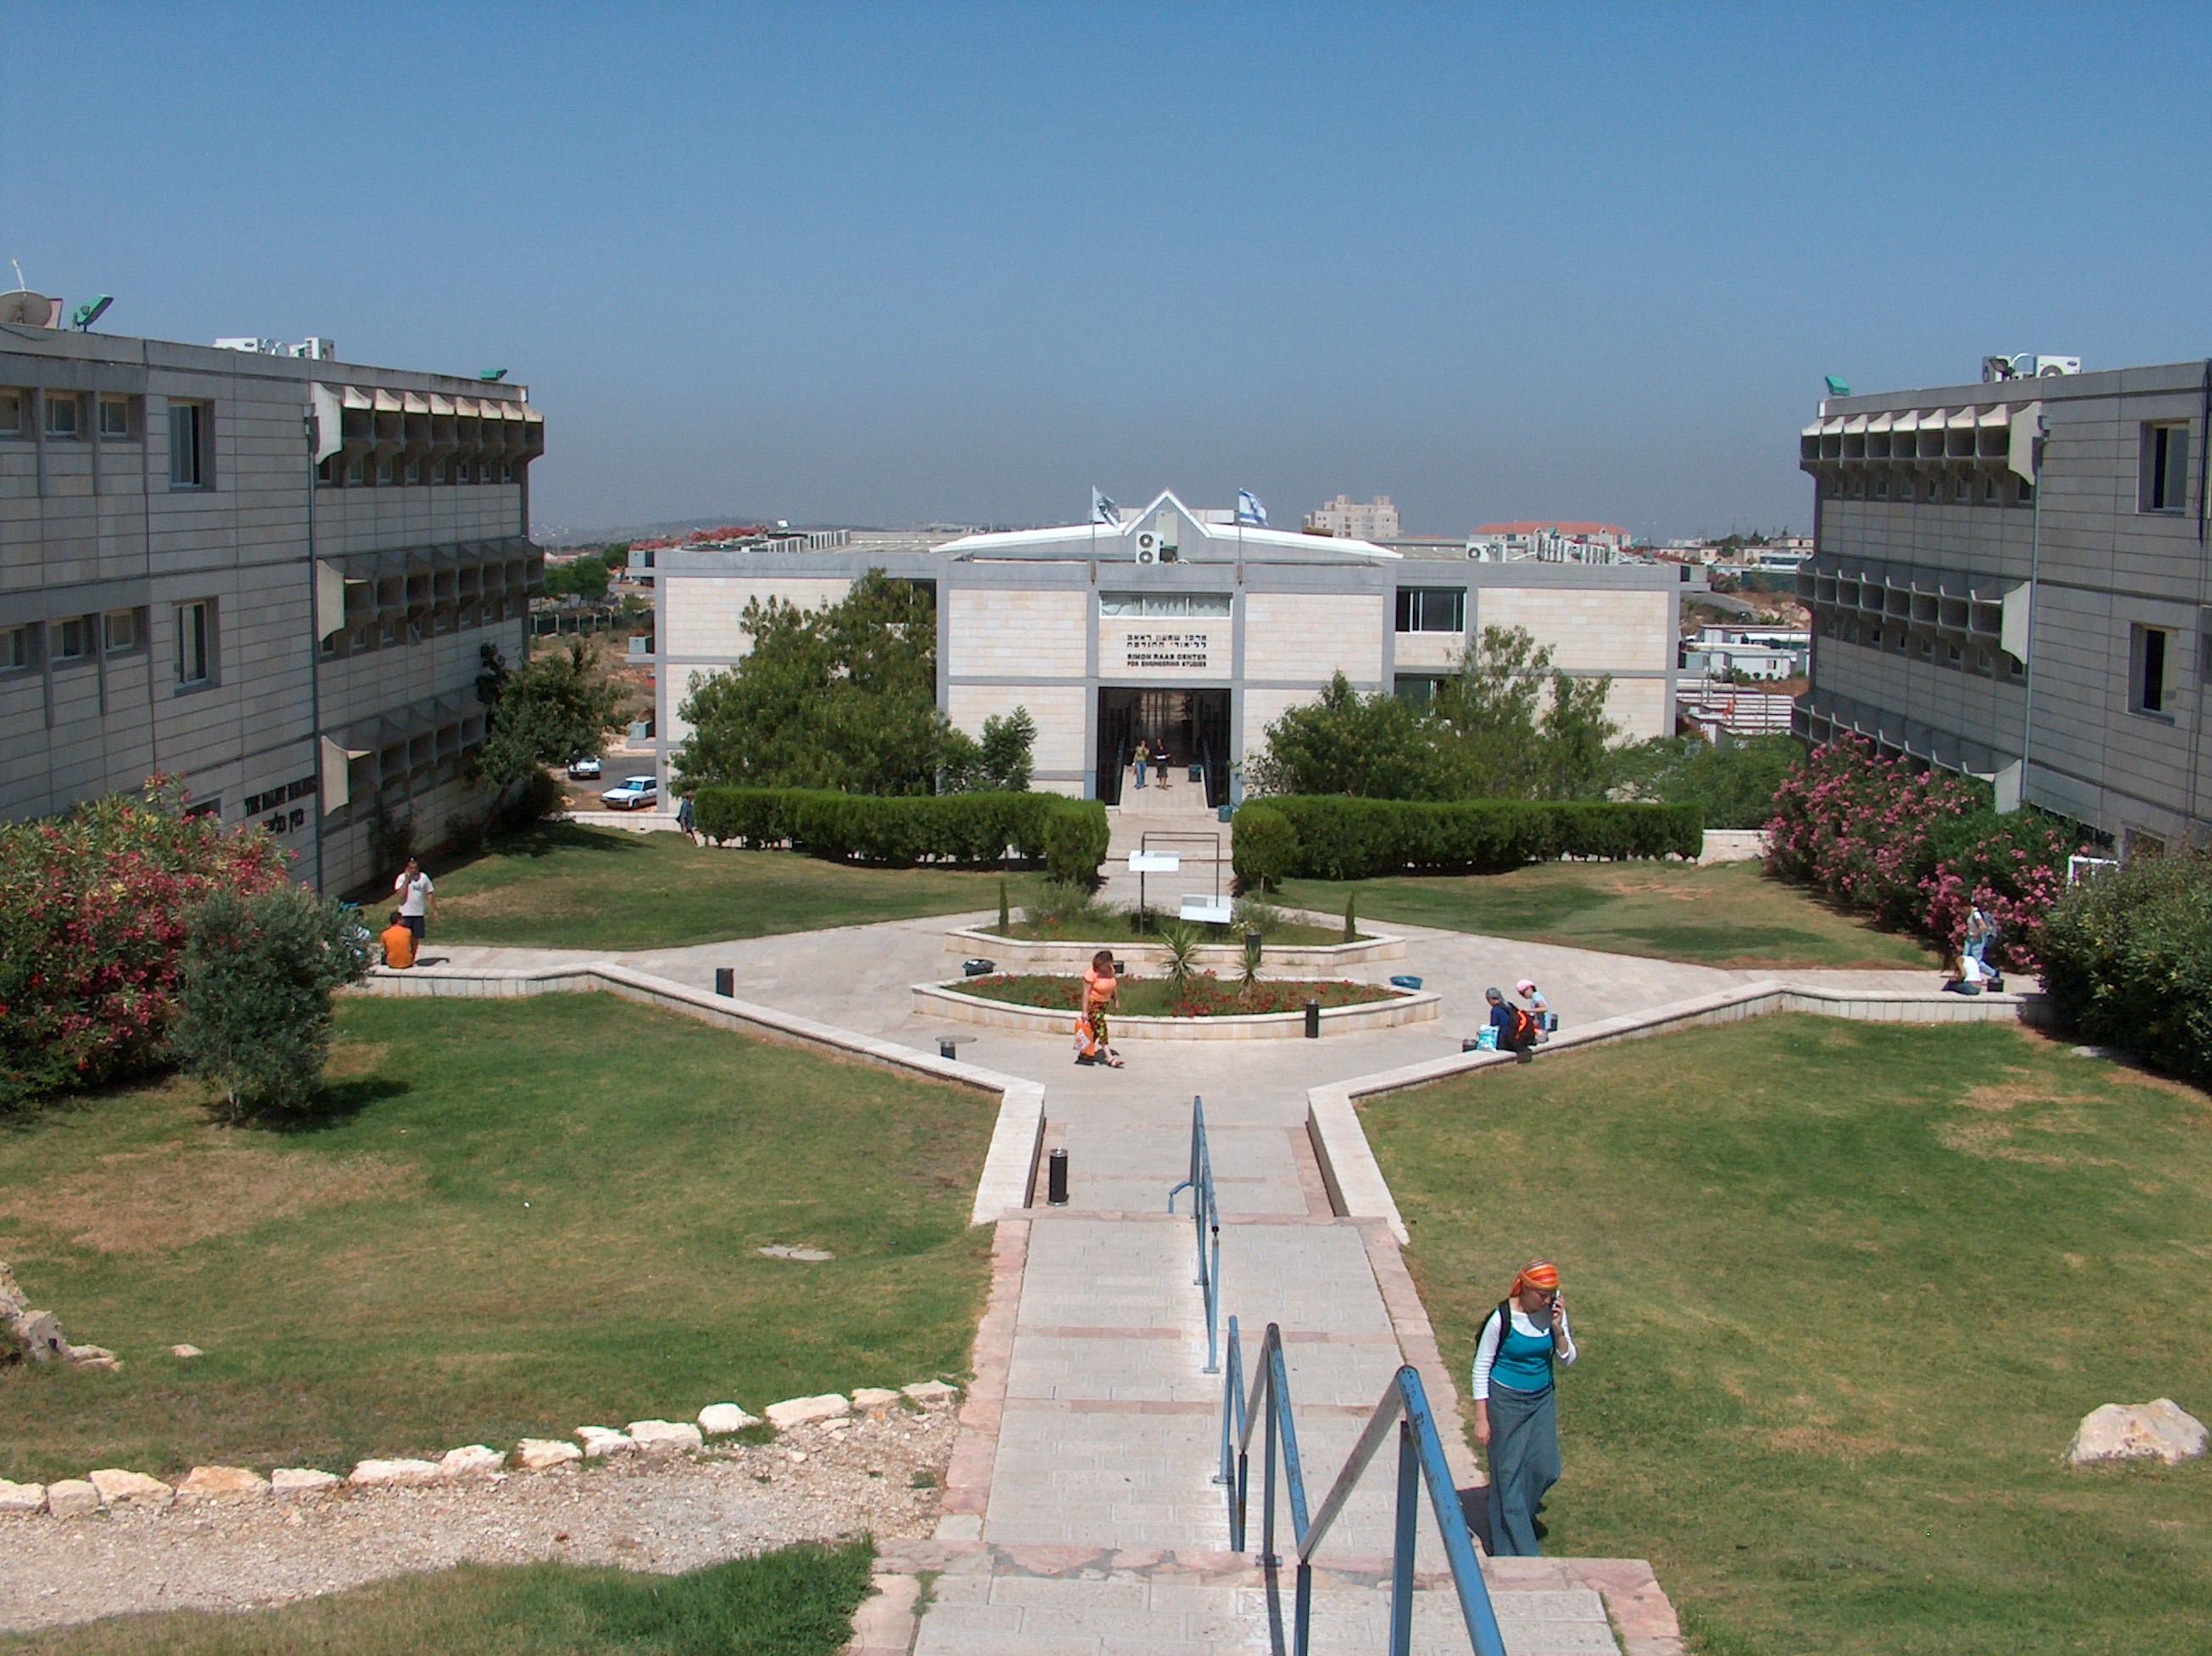 ariel_university_center.jpg